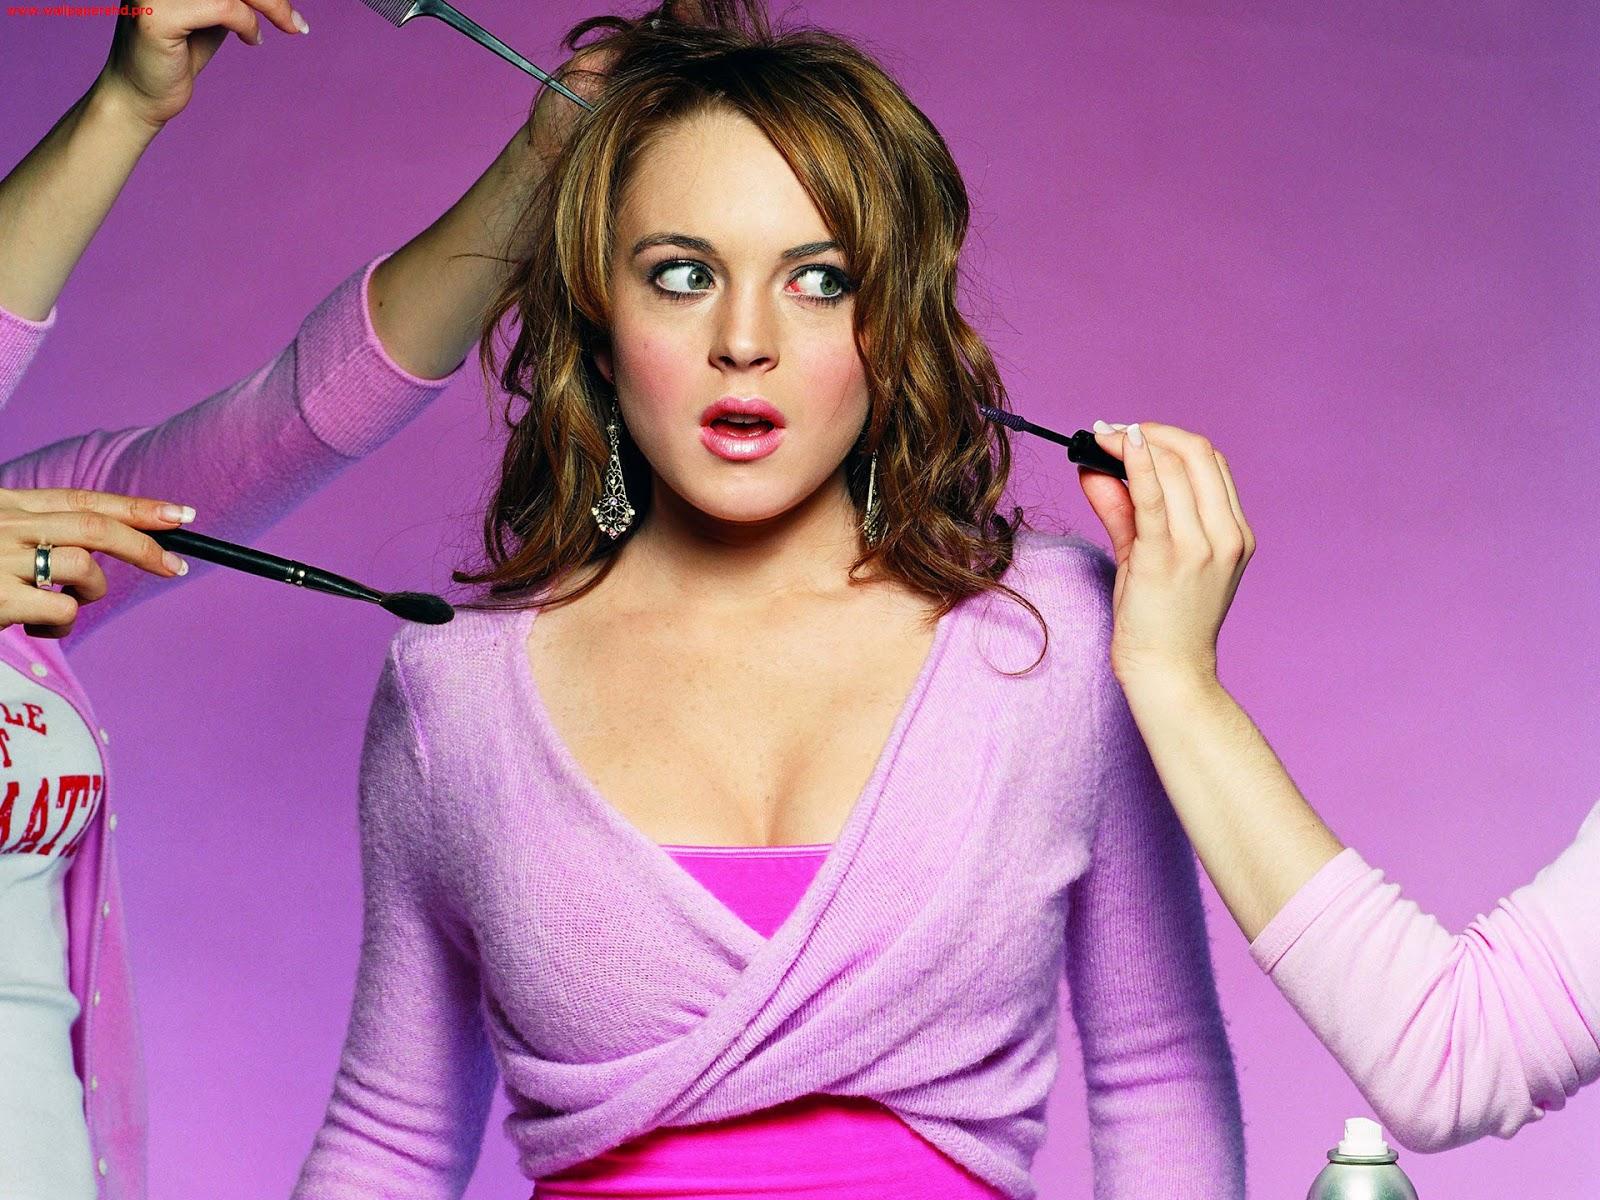 Lindsay Lohan, Mother Lodge Defamation Charges vs. Fox Network for ... Lindsay Lohan